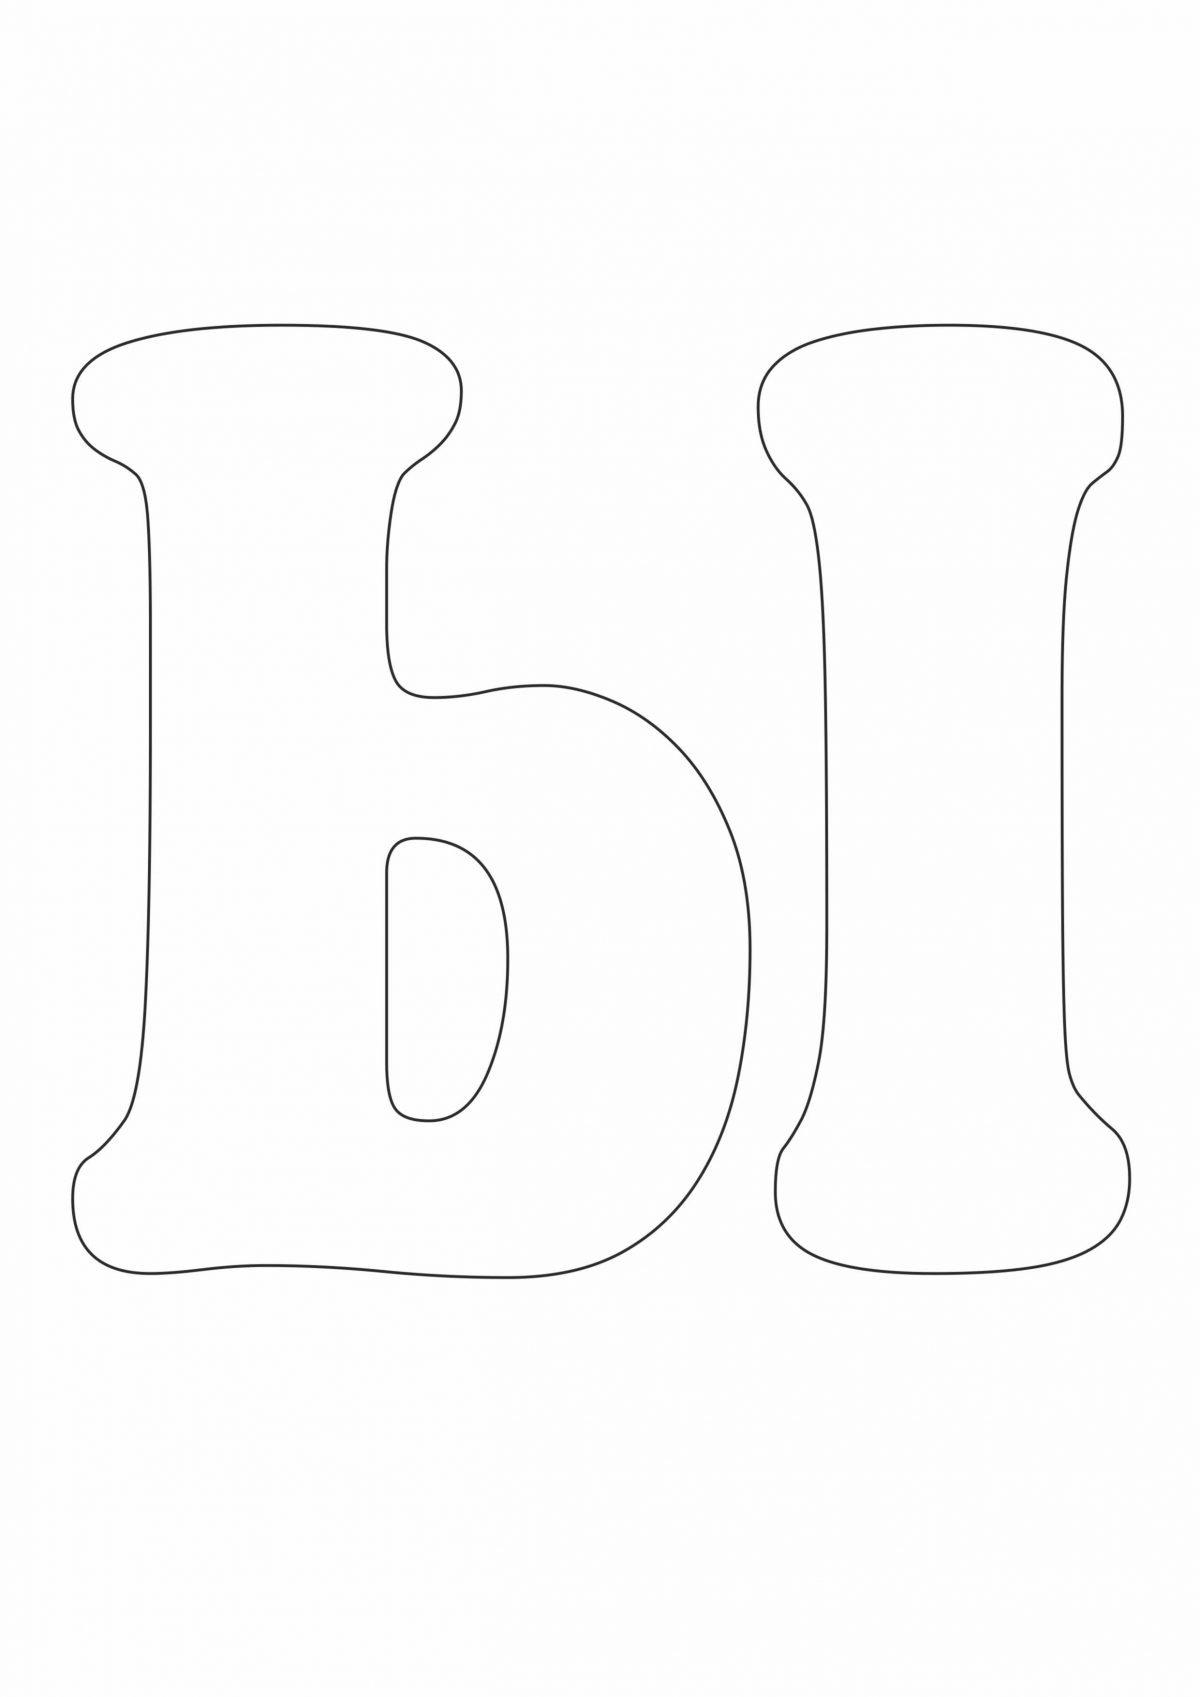 трафареты букв а5 для вырезания из бумаги шаблоны дочерью